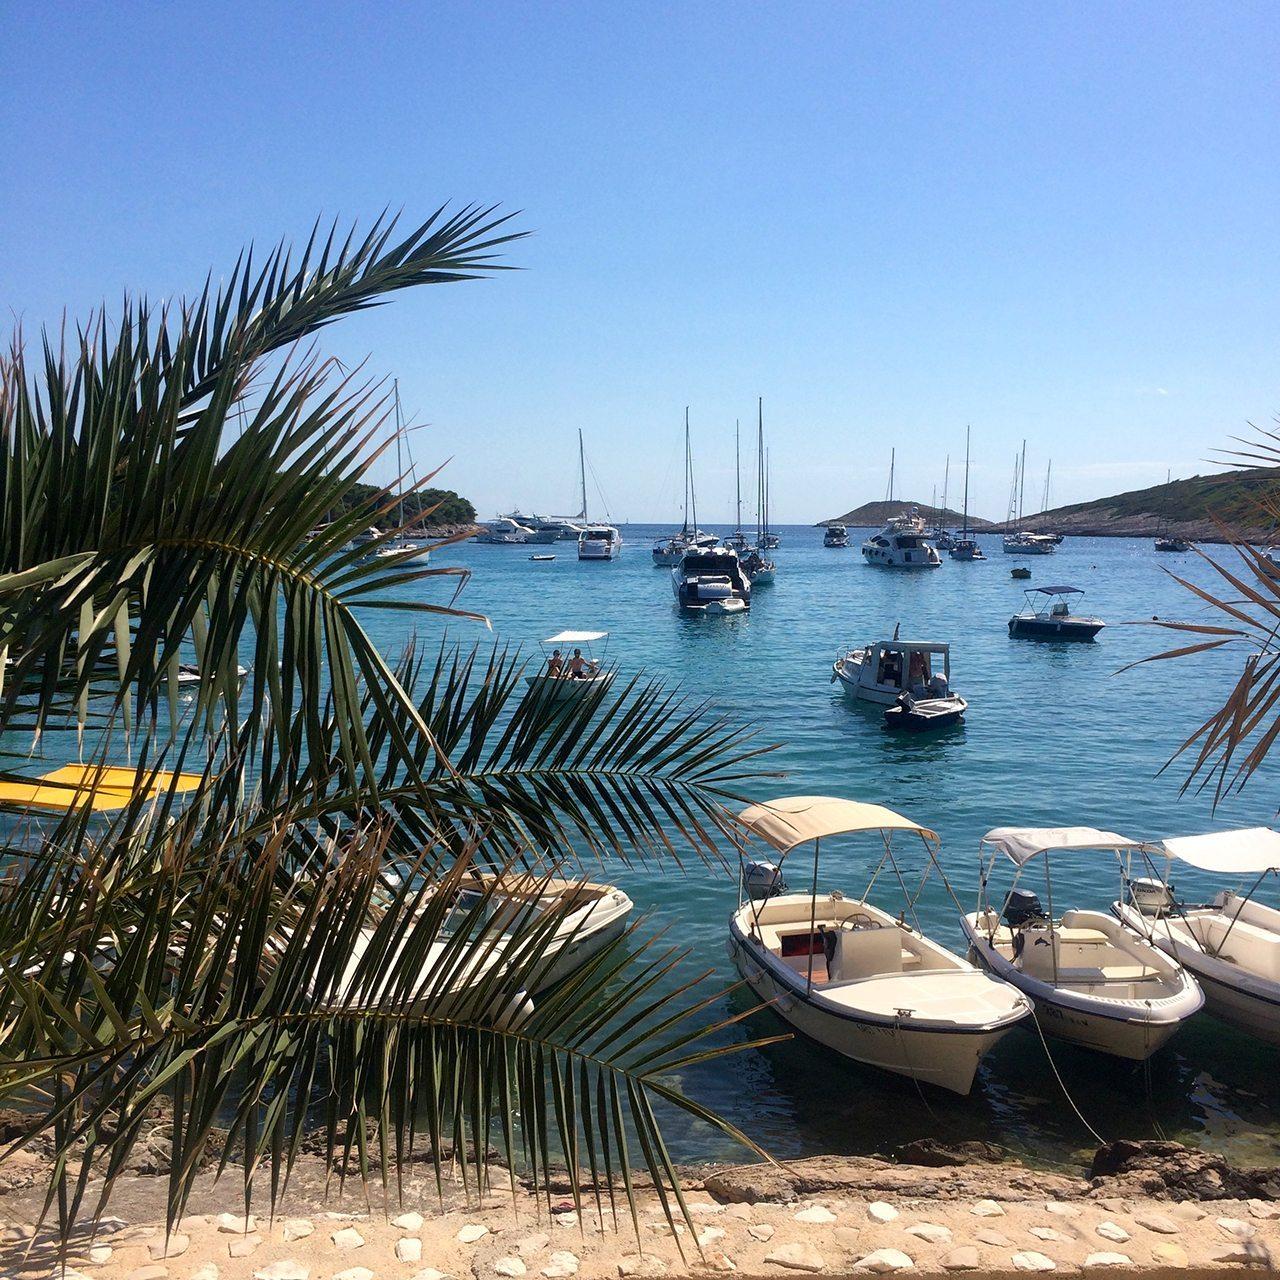 MedSailors Hvar Party Island Croatia Boats Docked 2